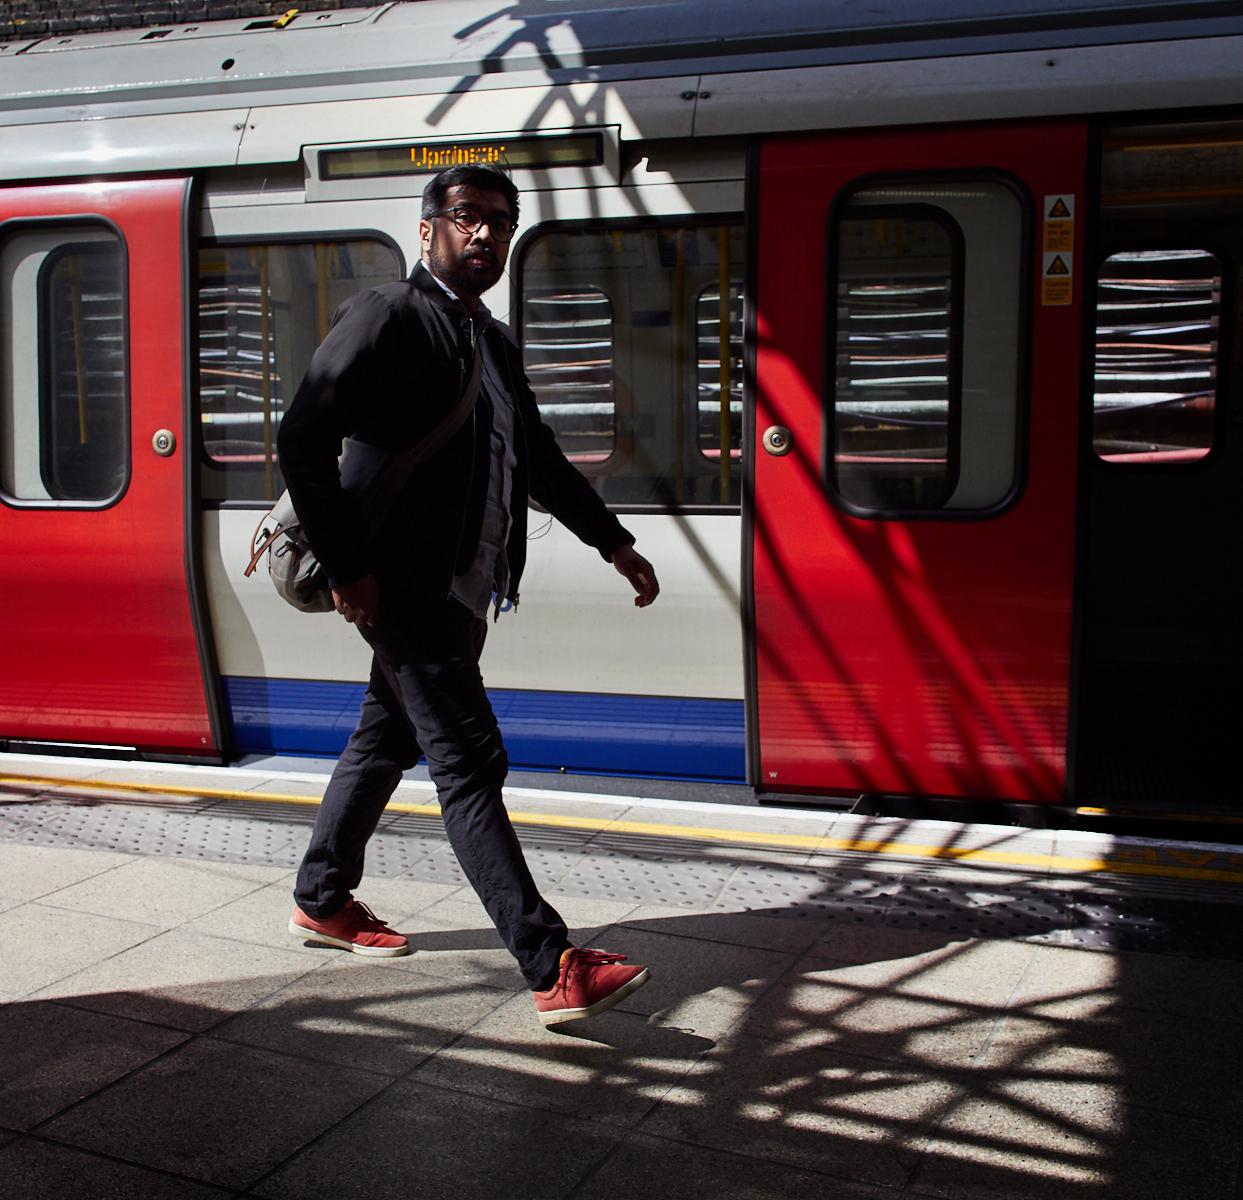 Whitechapel station1600x1200 sRGB.jpg